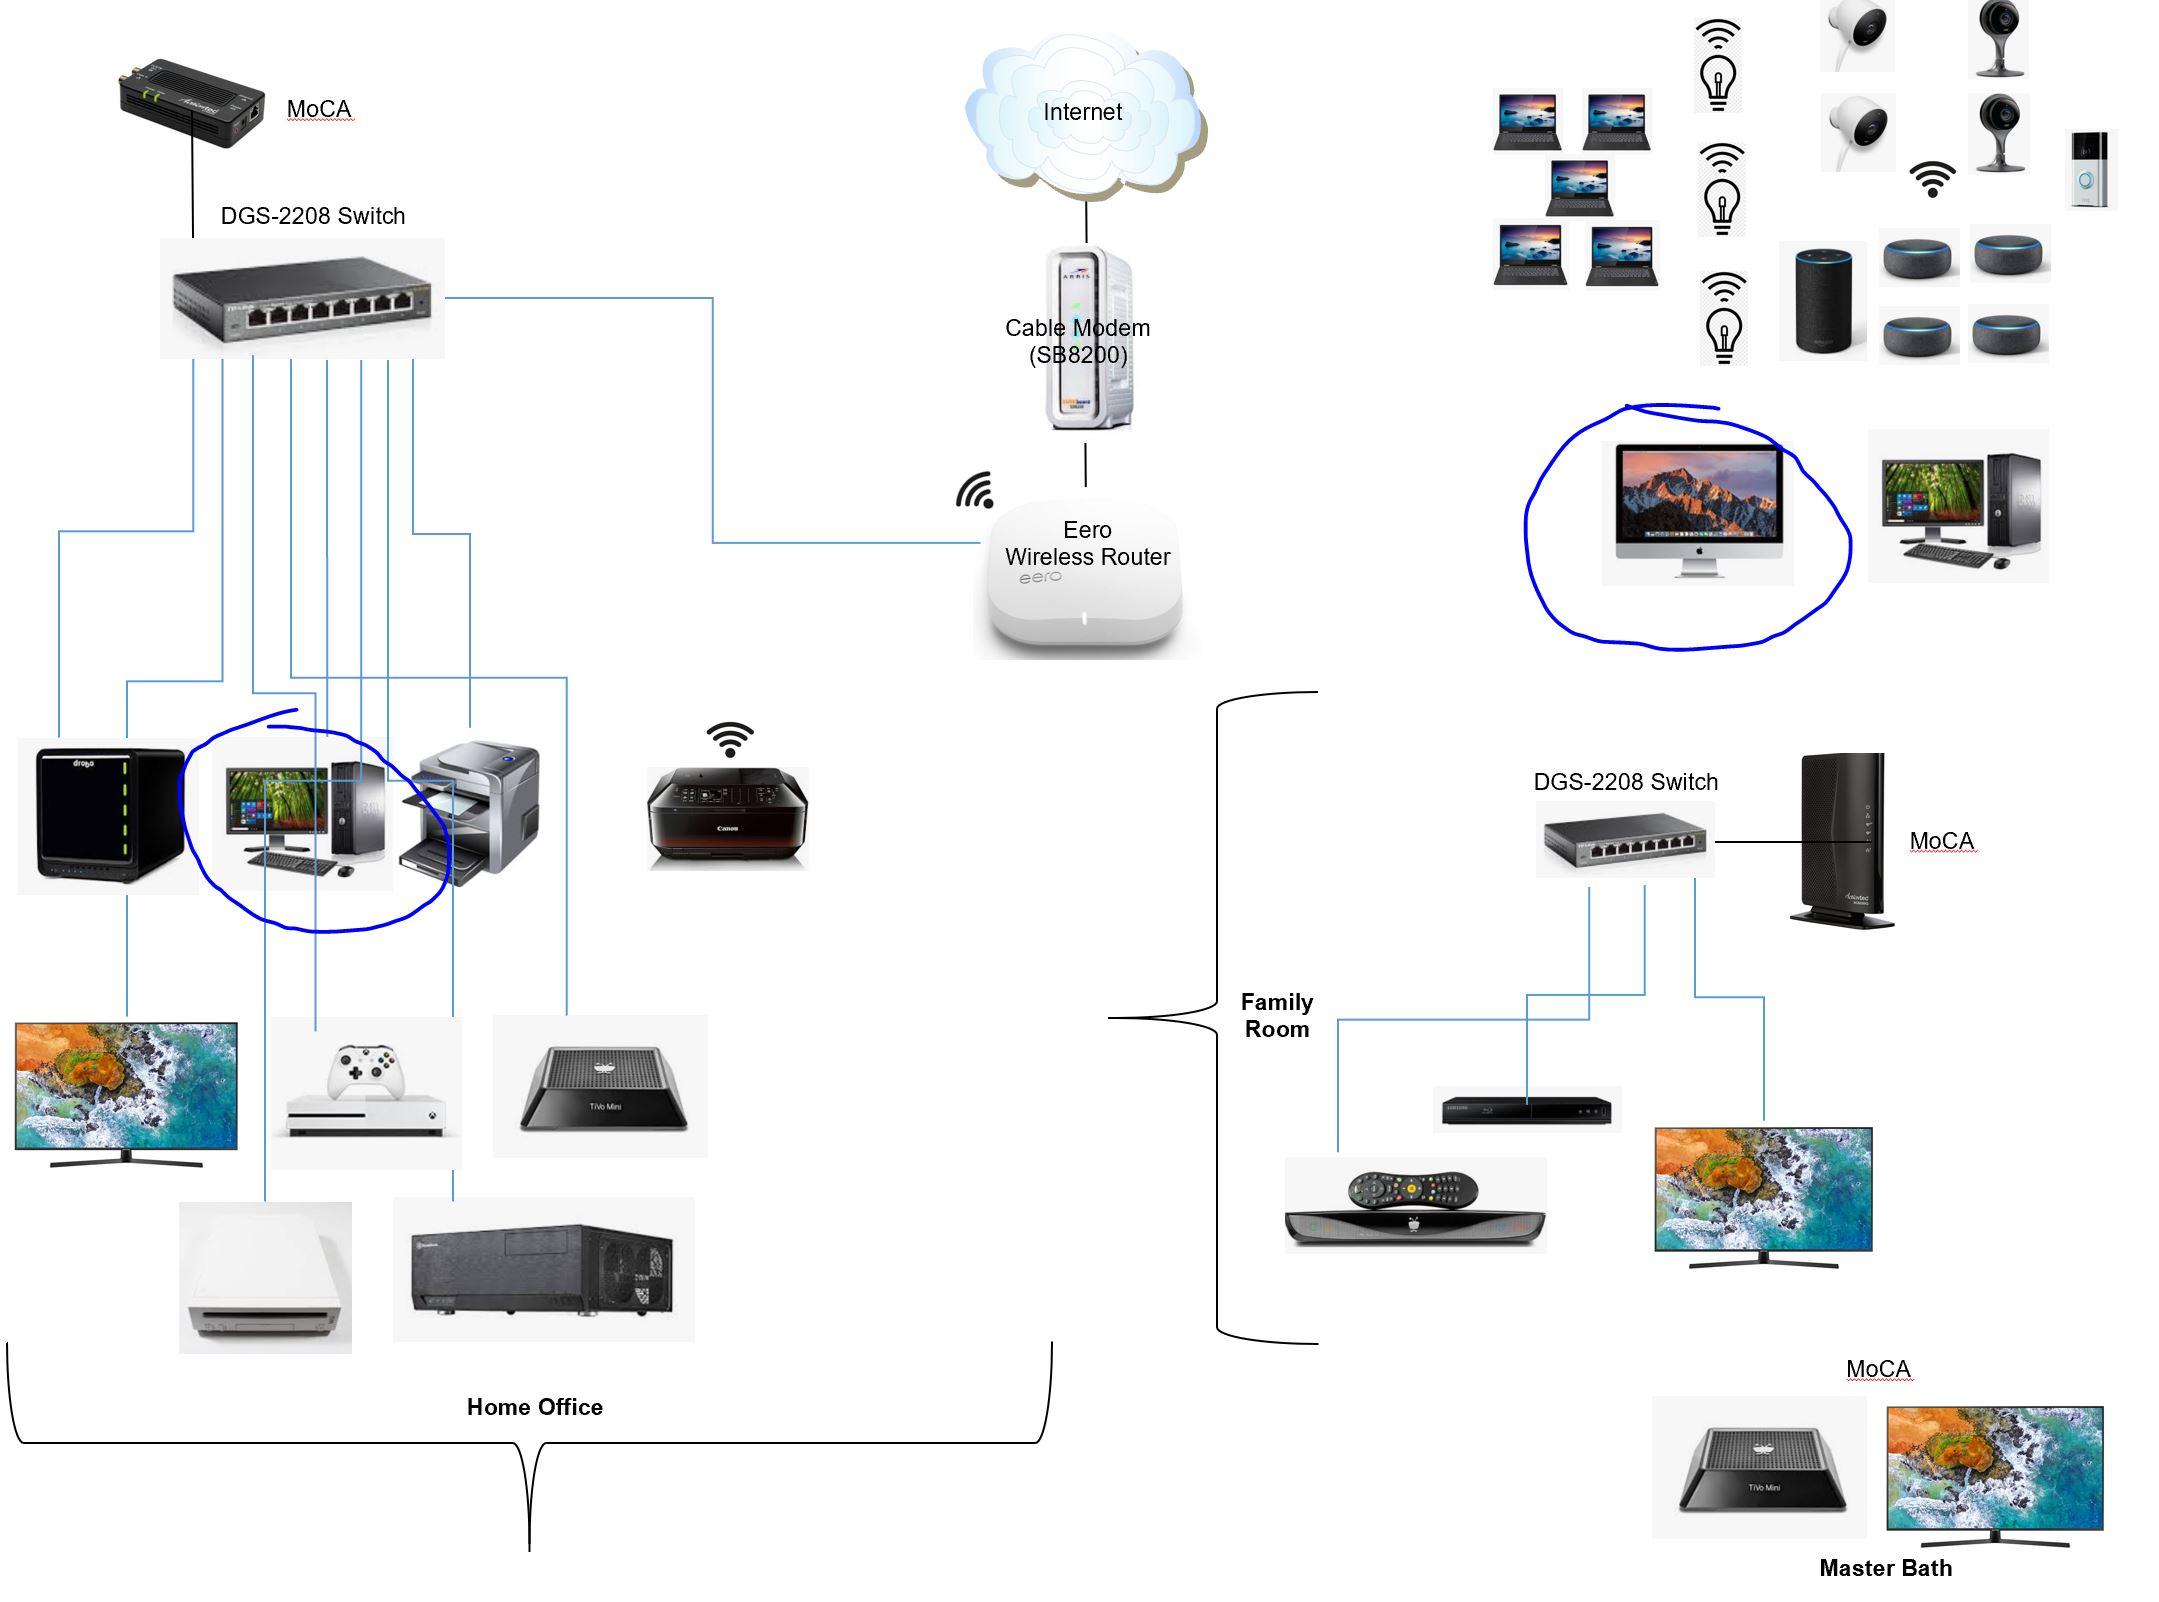 NetworkDiagramv2.JPG